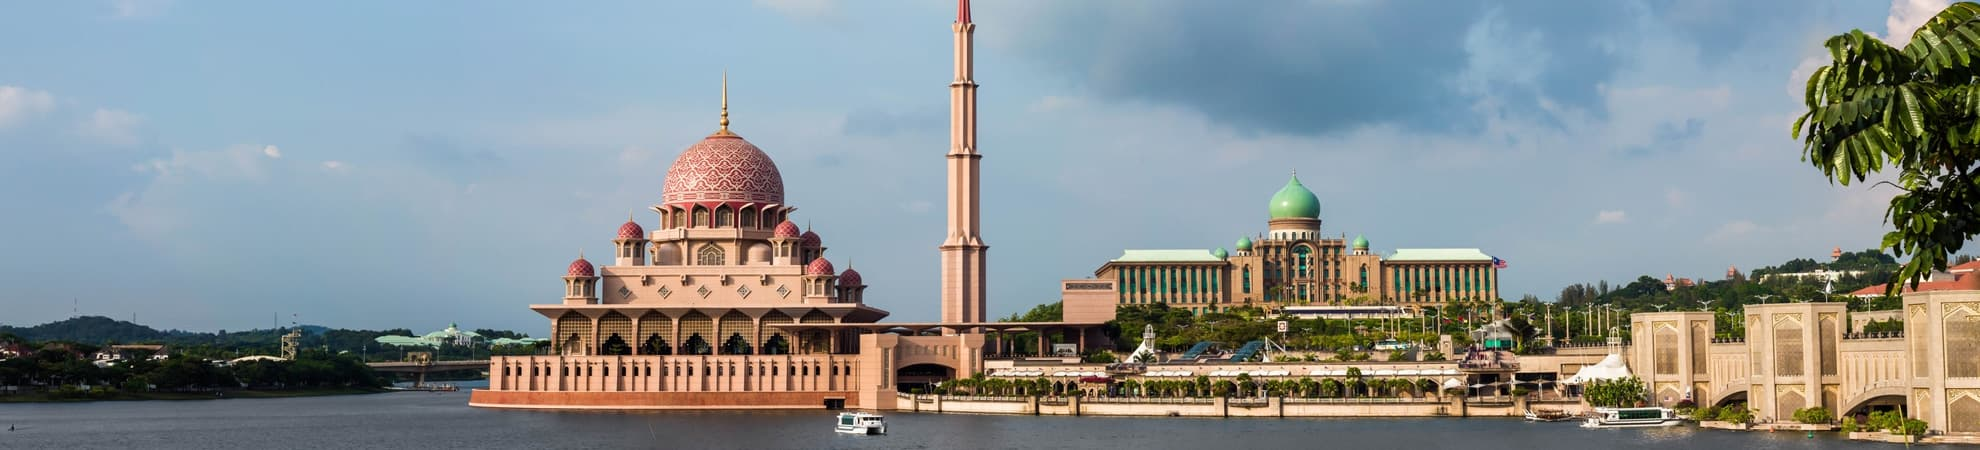 Séjour Malaisie